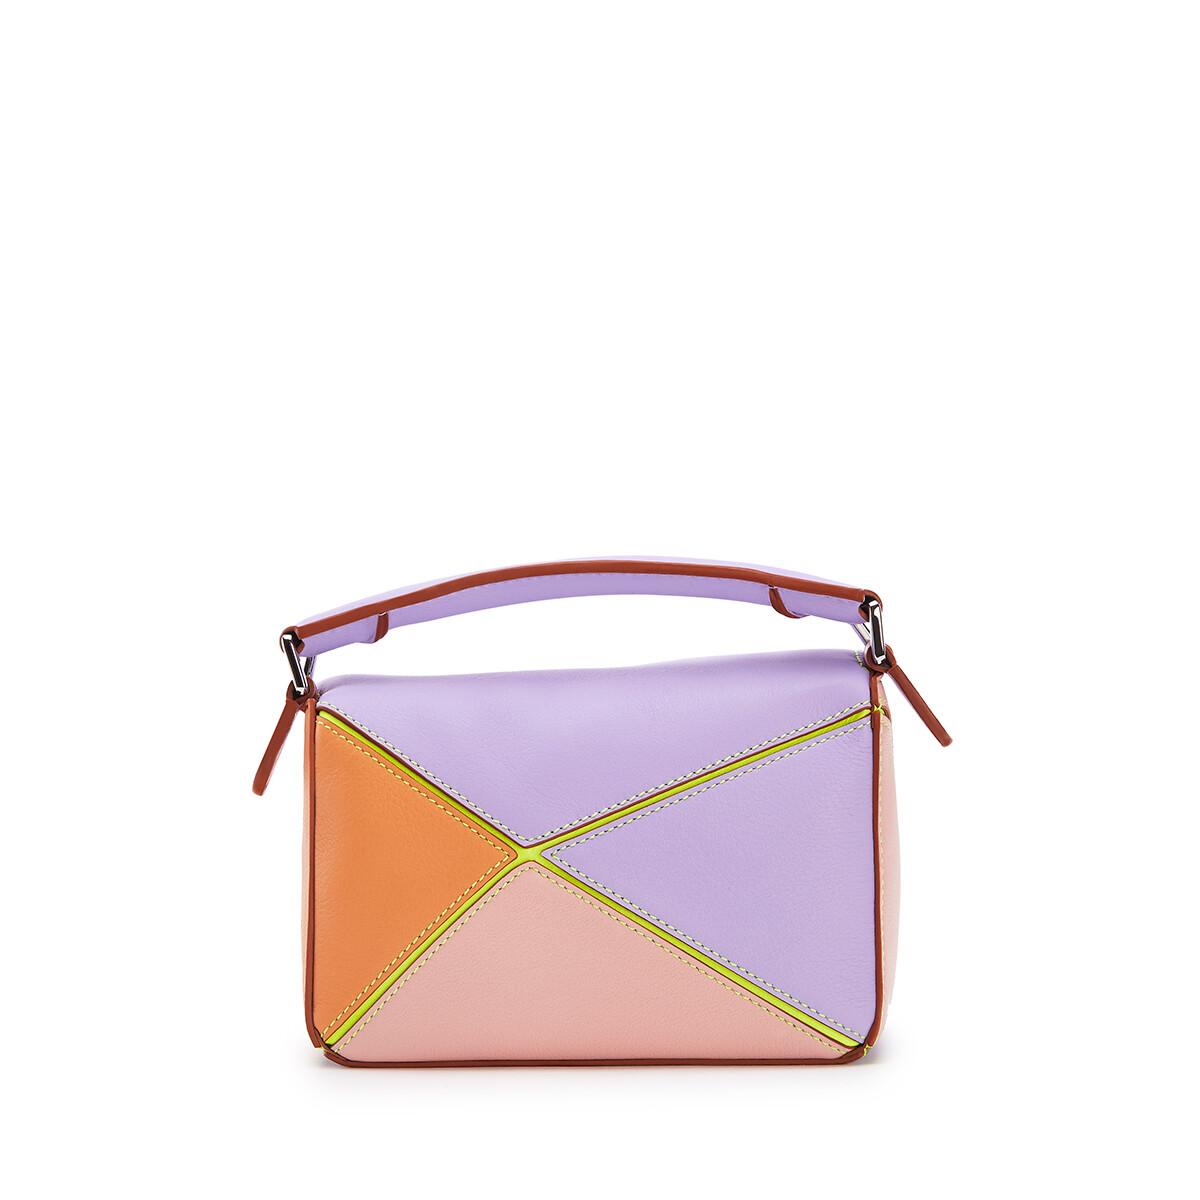 LOEWE Mini Puzzle Bag In Classic Calfskin Mauve/Soft Apricot front